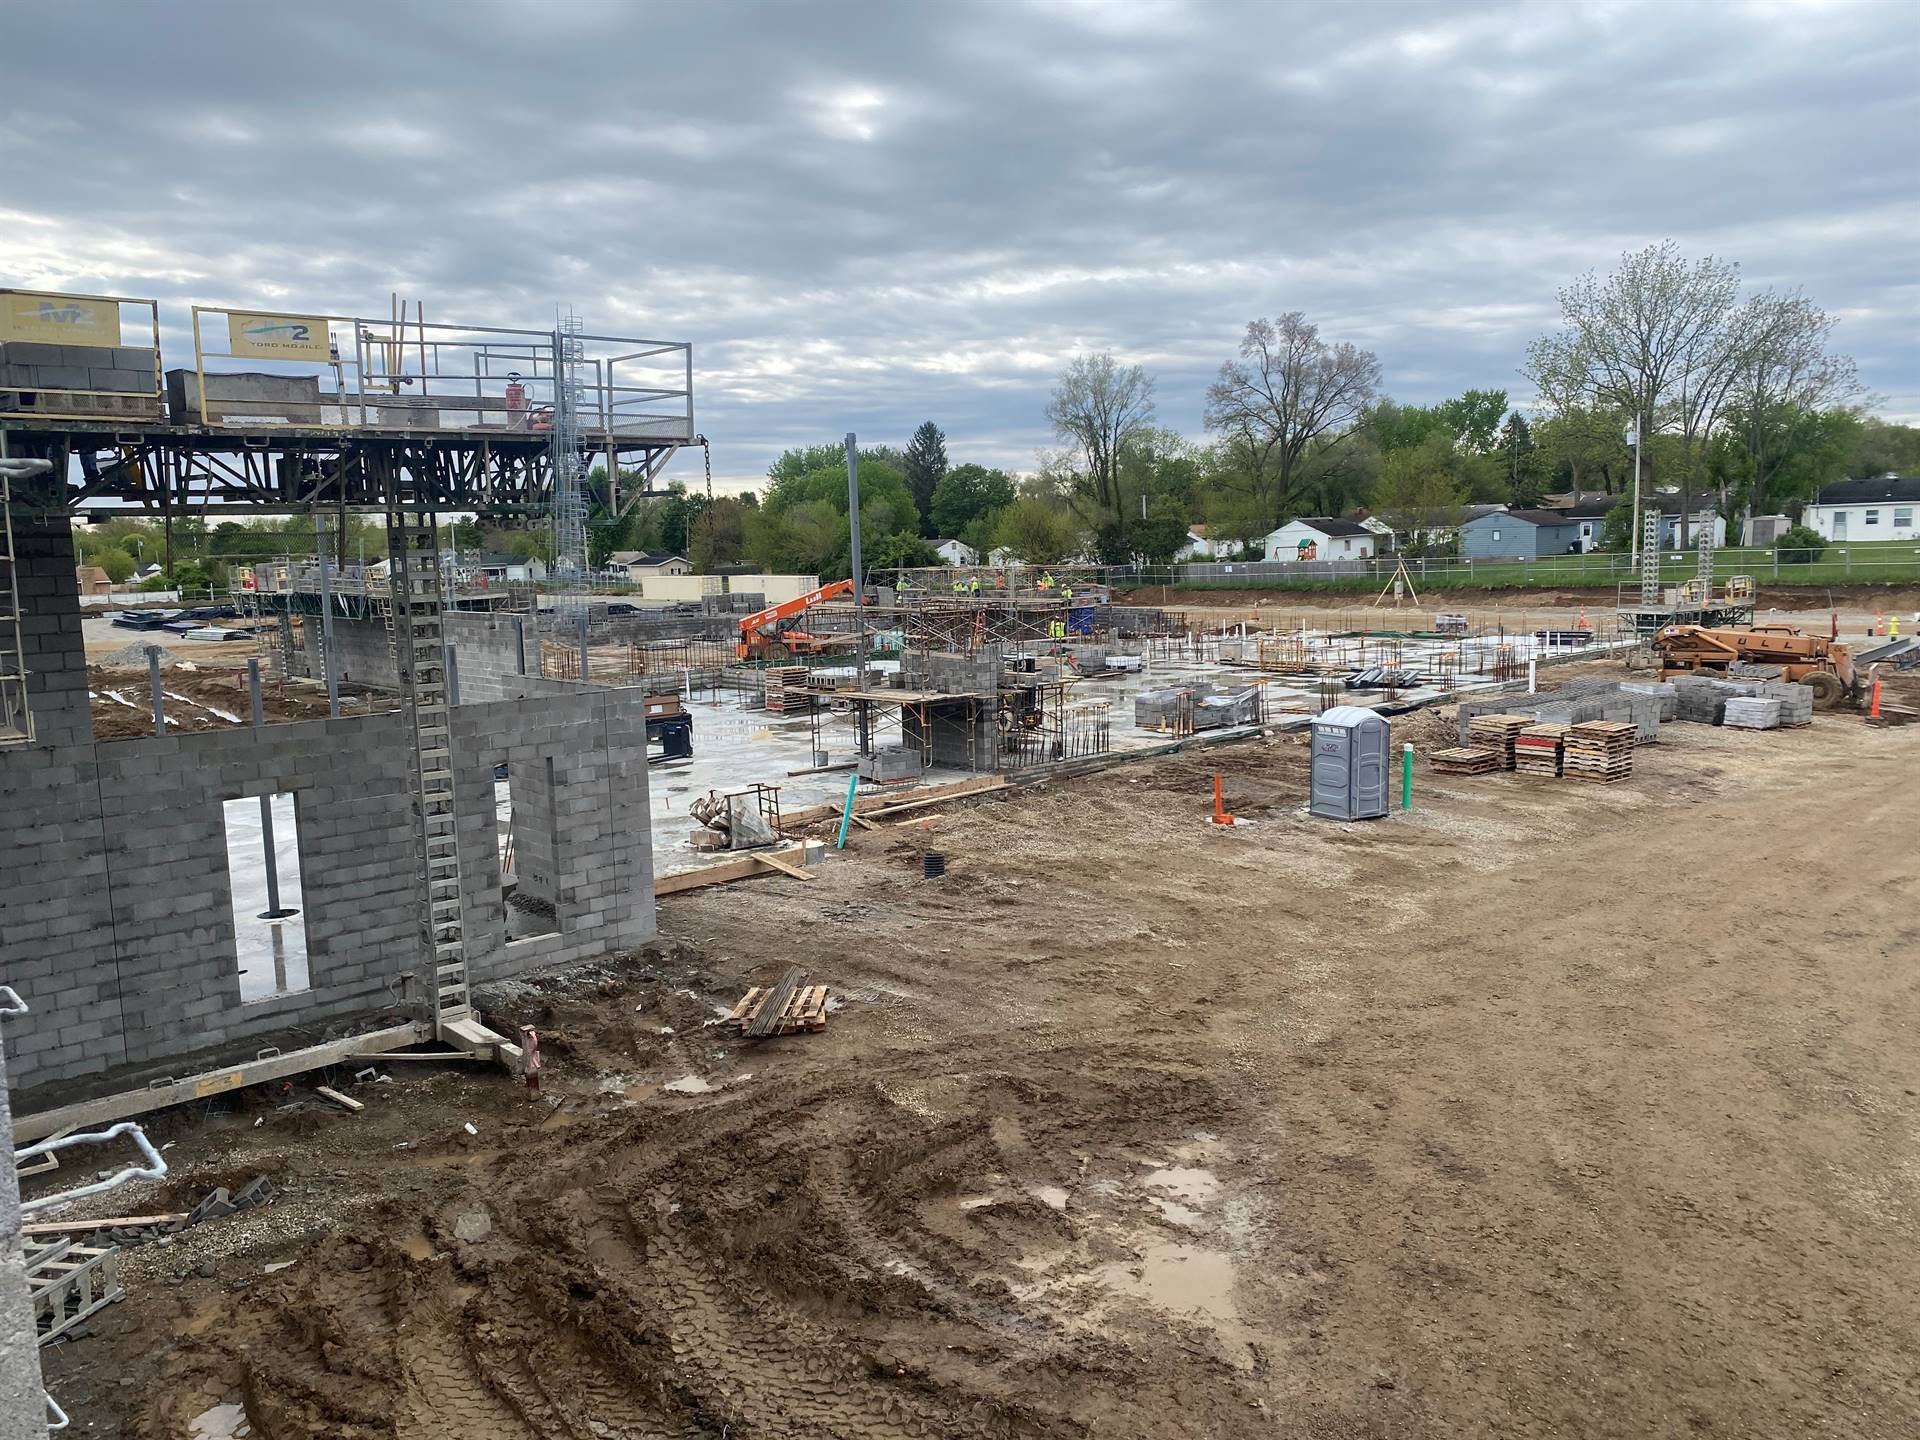 Area C-May 12, 2021 Fairborn Intermediate construction site